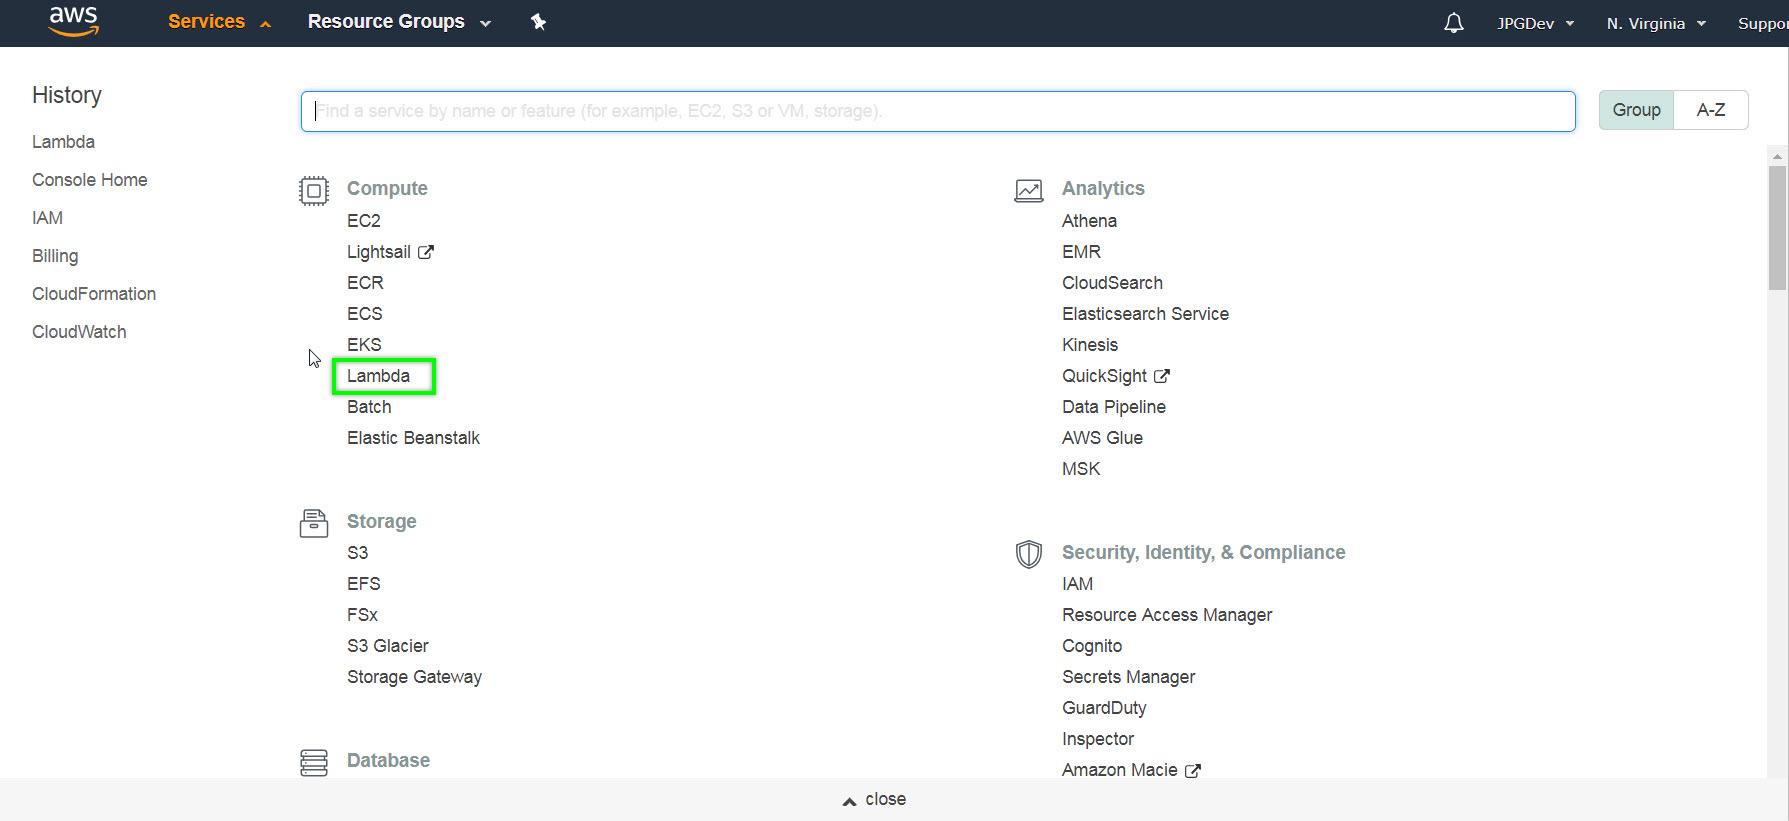 aws-services_menu.jpg